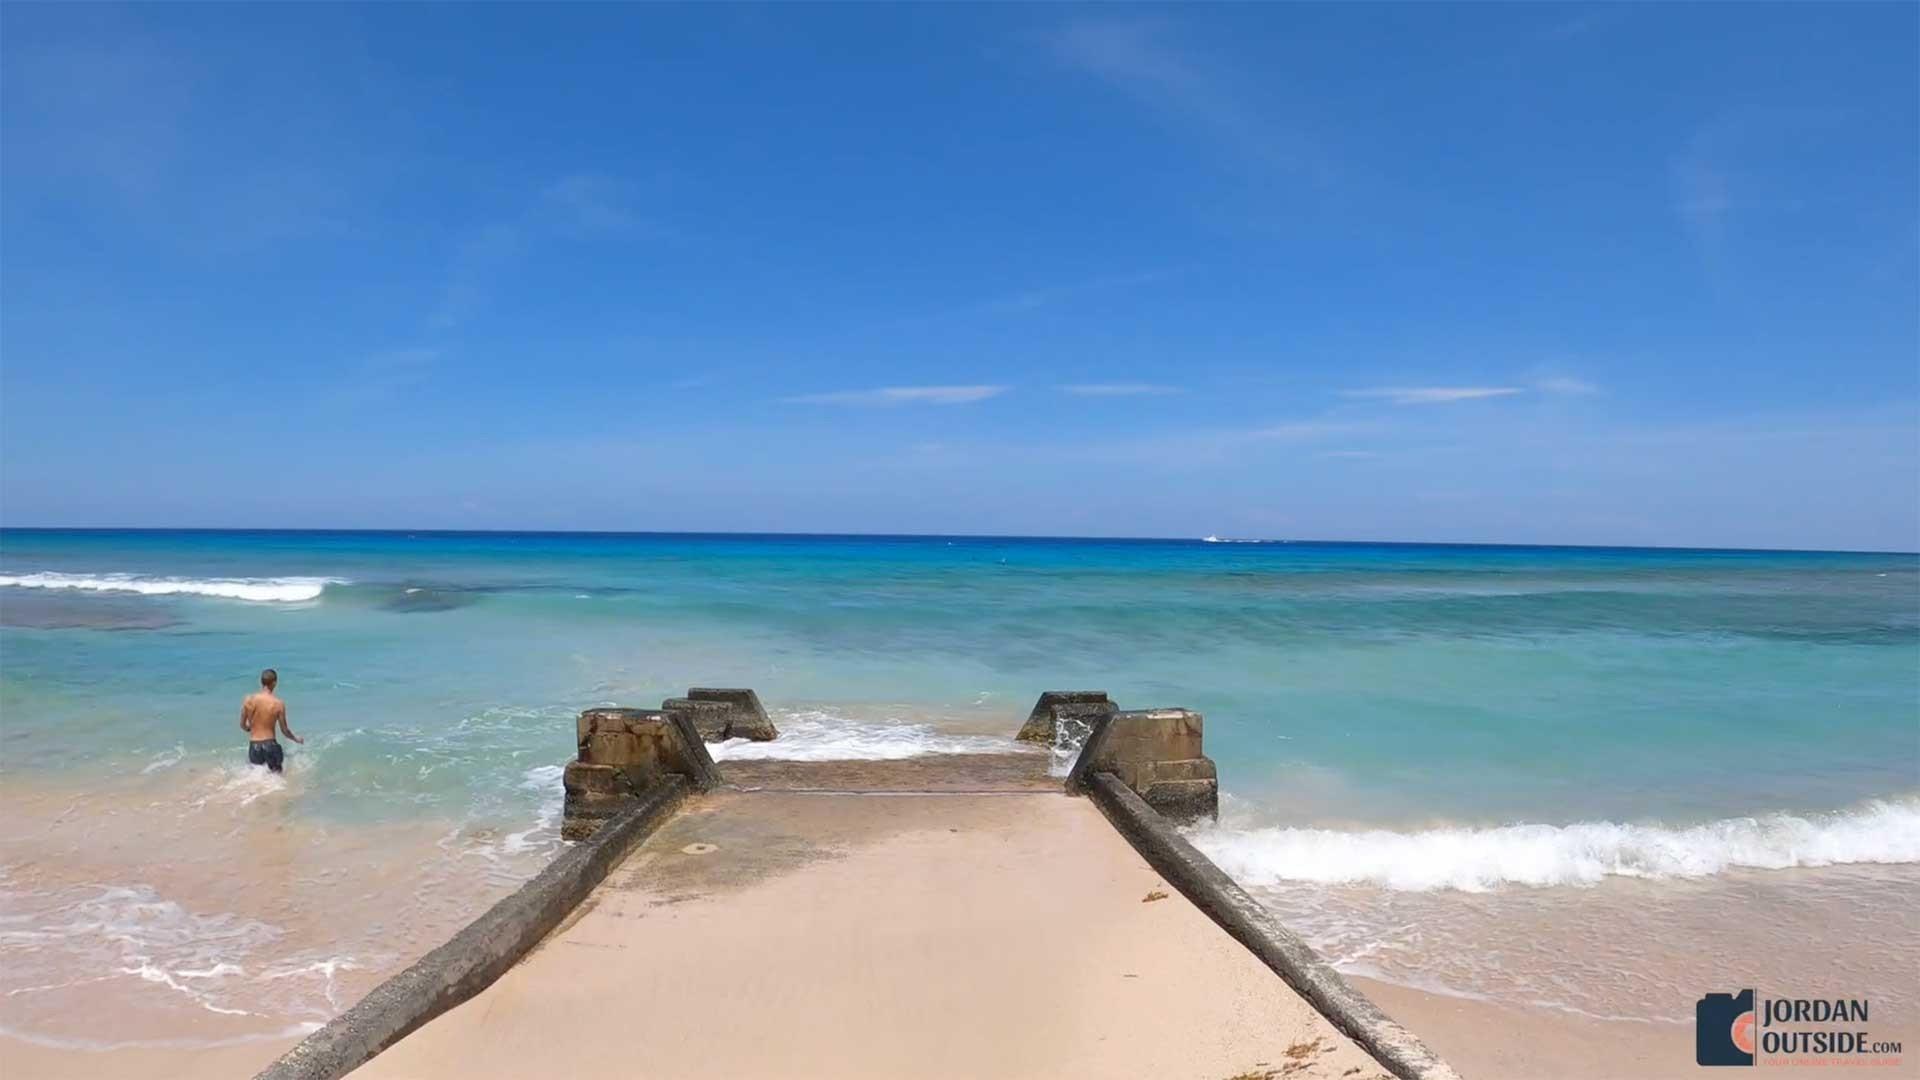 Pier View at Cane Bay Beach, St. Croix